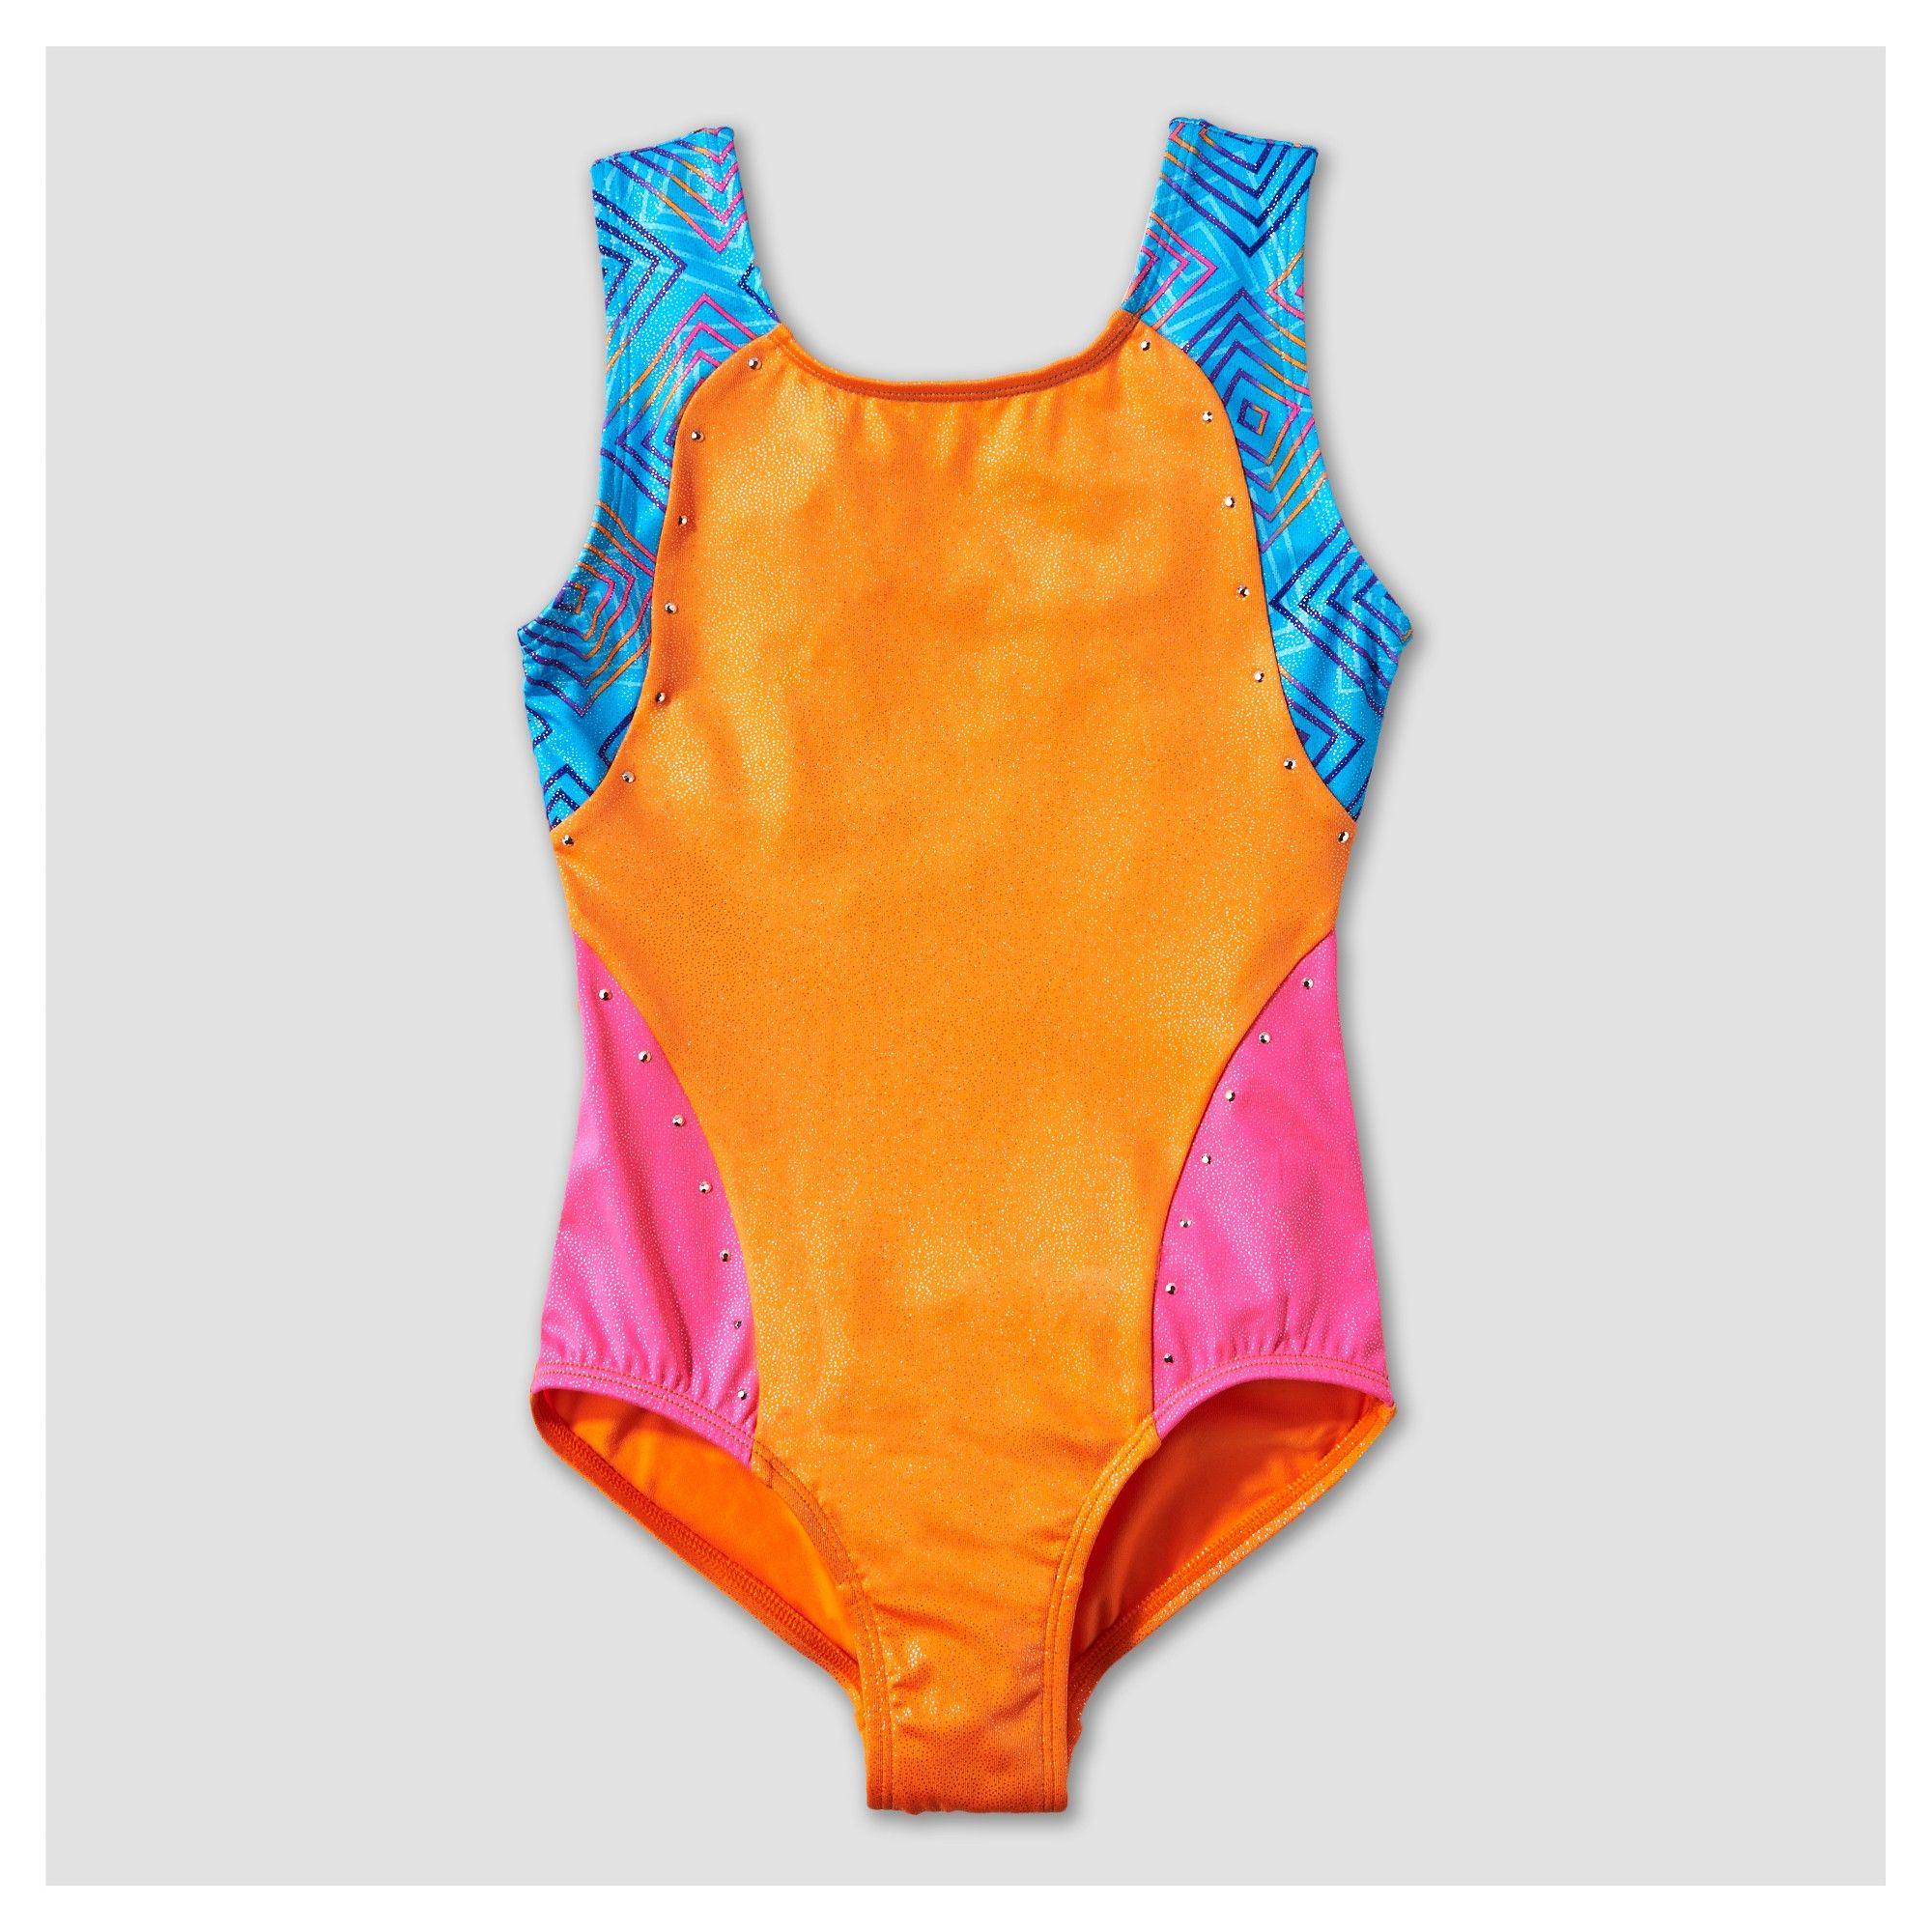 4e5991bd5 Freestyle by Danskin Girls  Leotards - Orange M